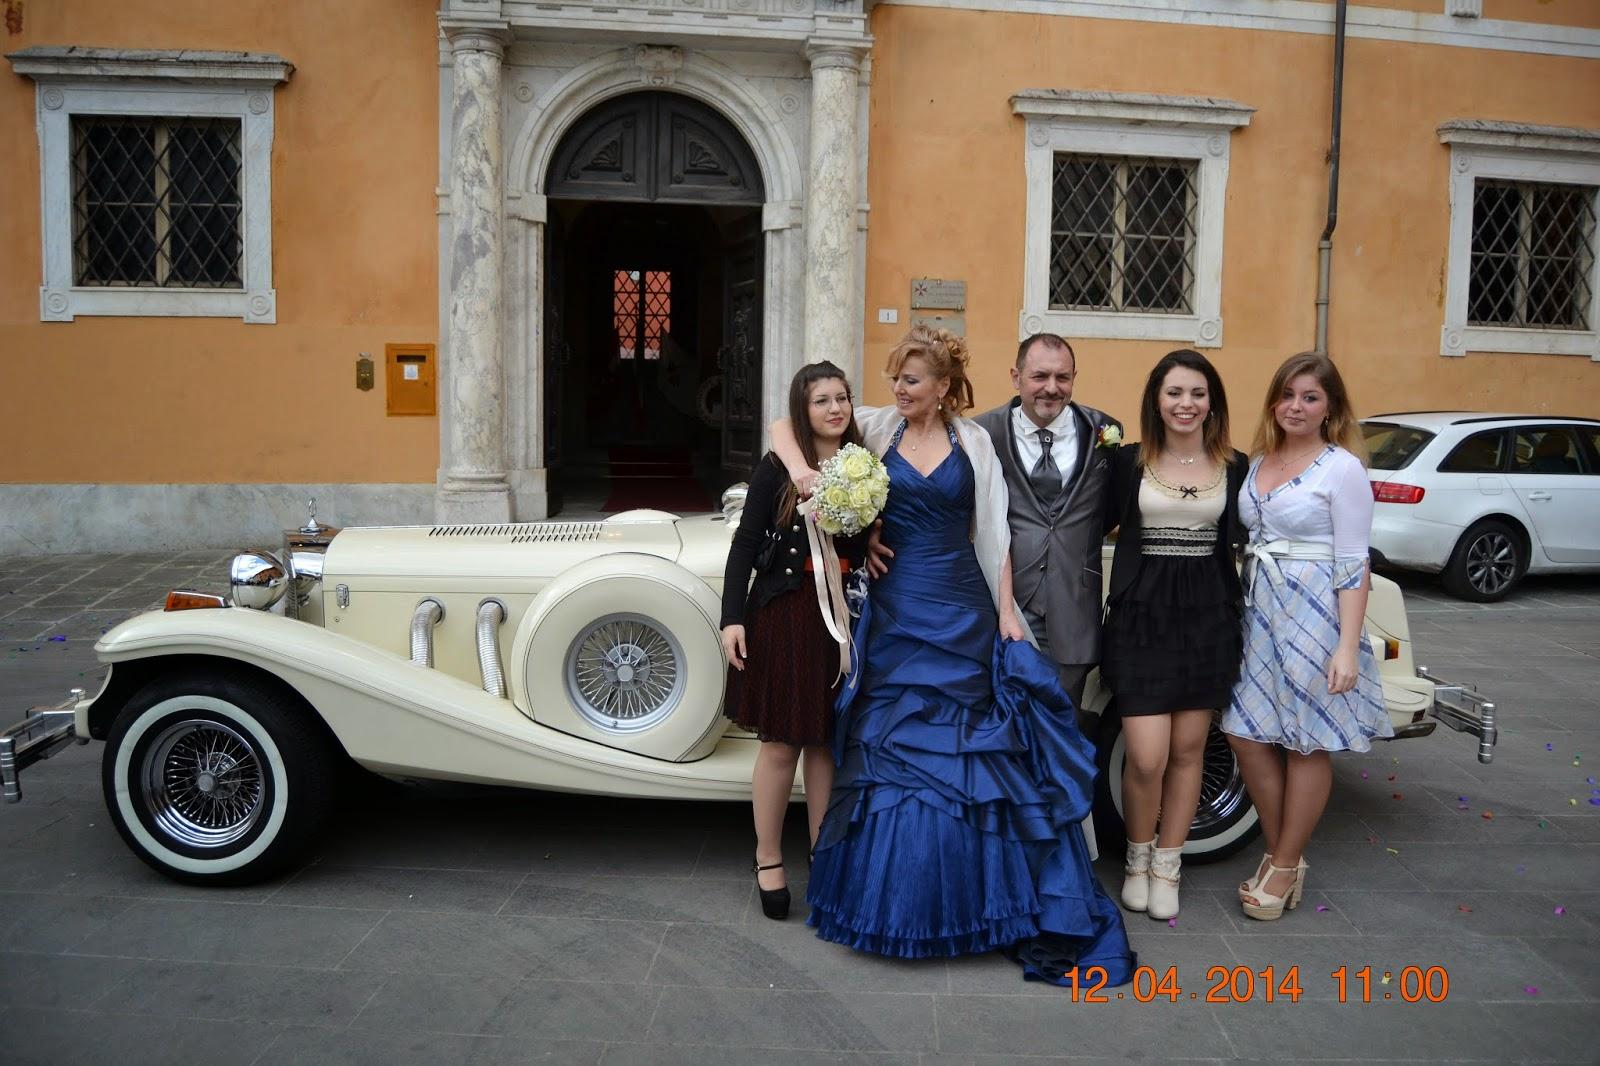 Wedding princess at the Pisa